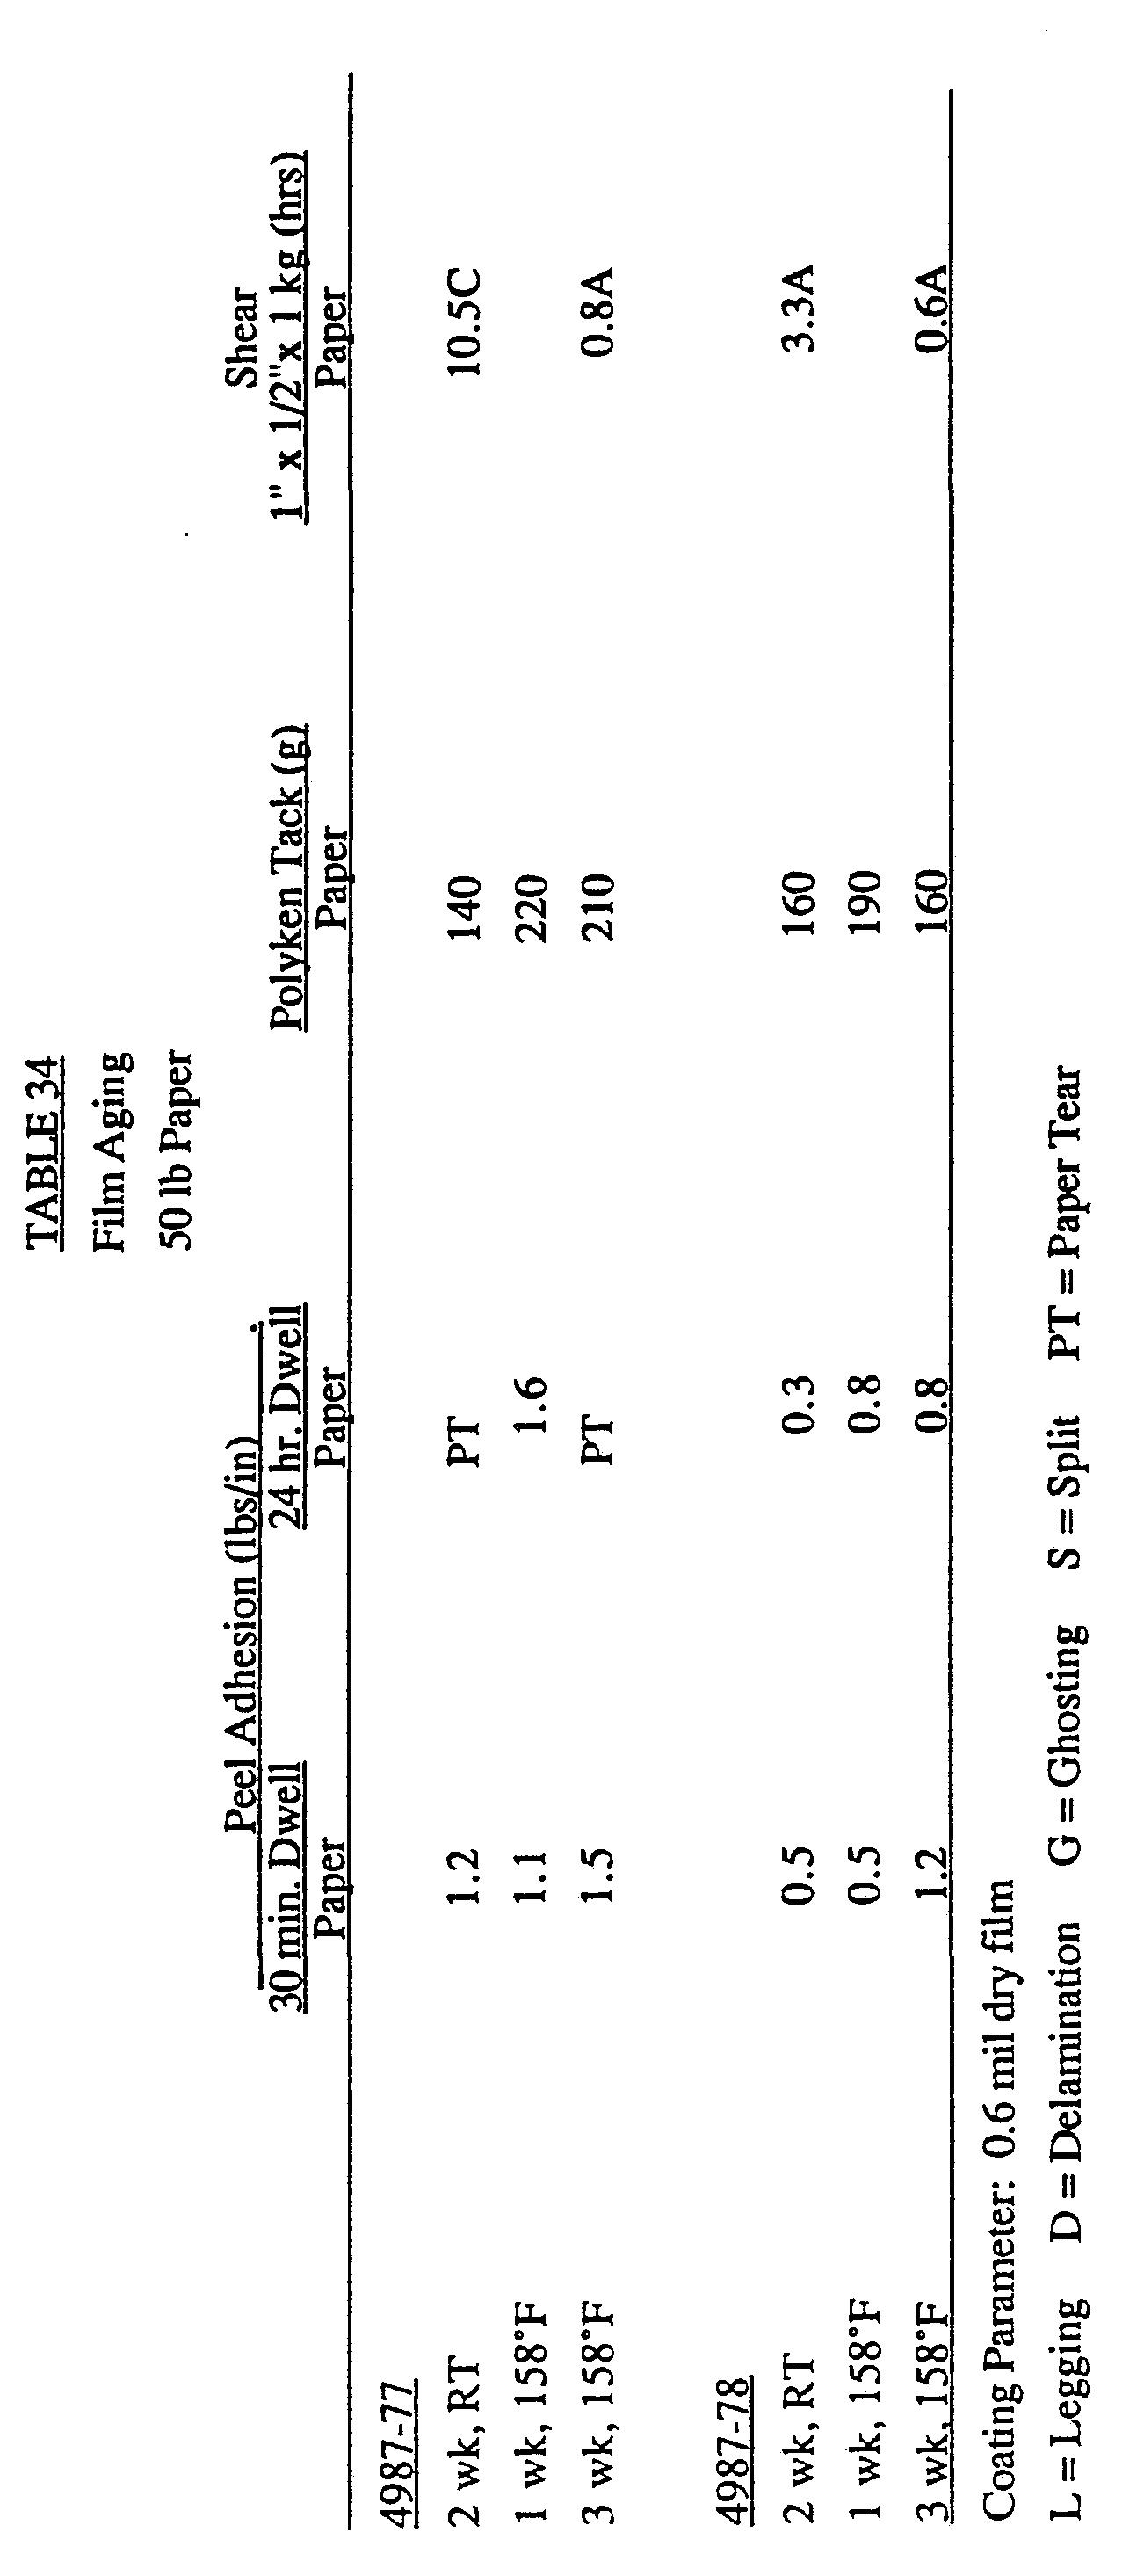 Polyvinyl Chloride Emulsion | Wiring Diagram Database